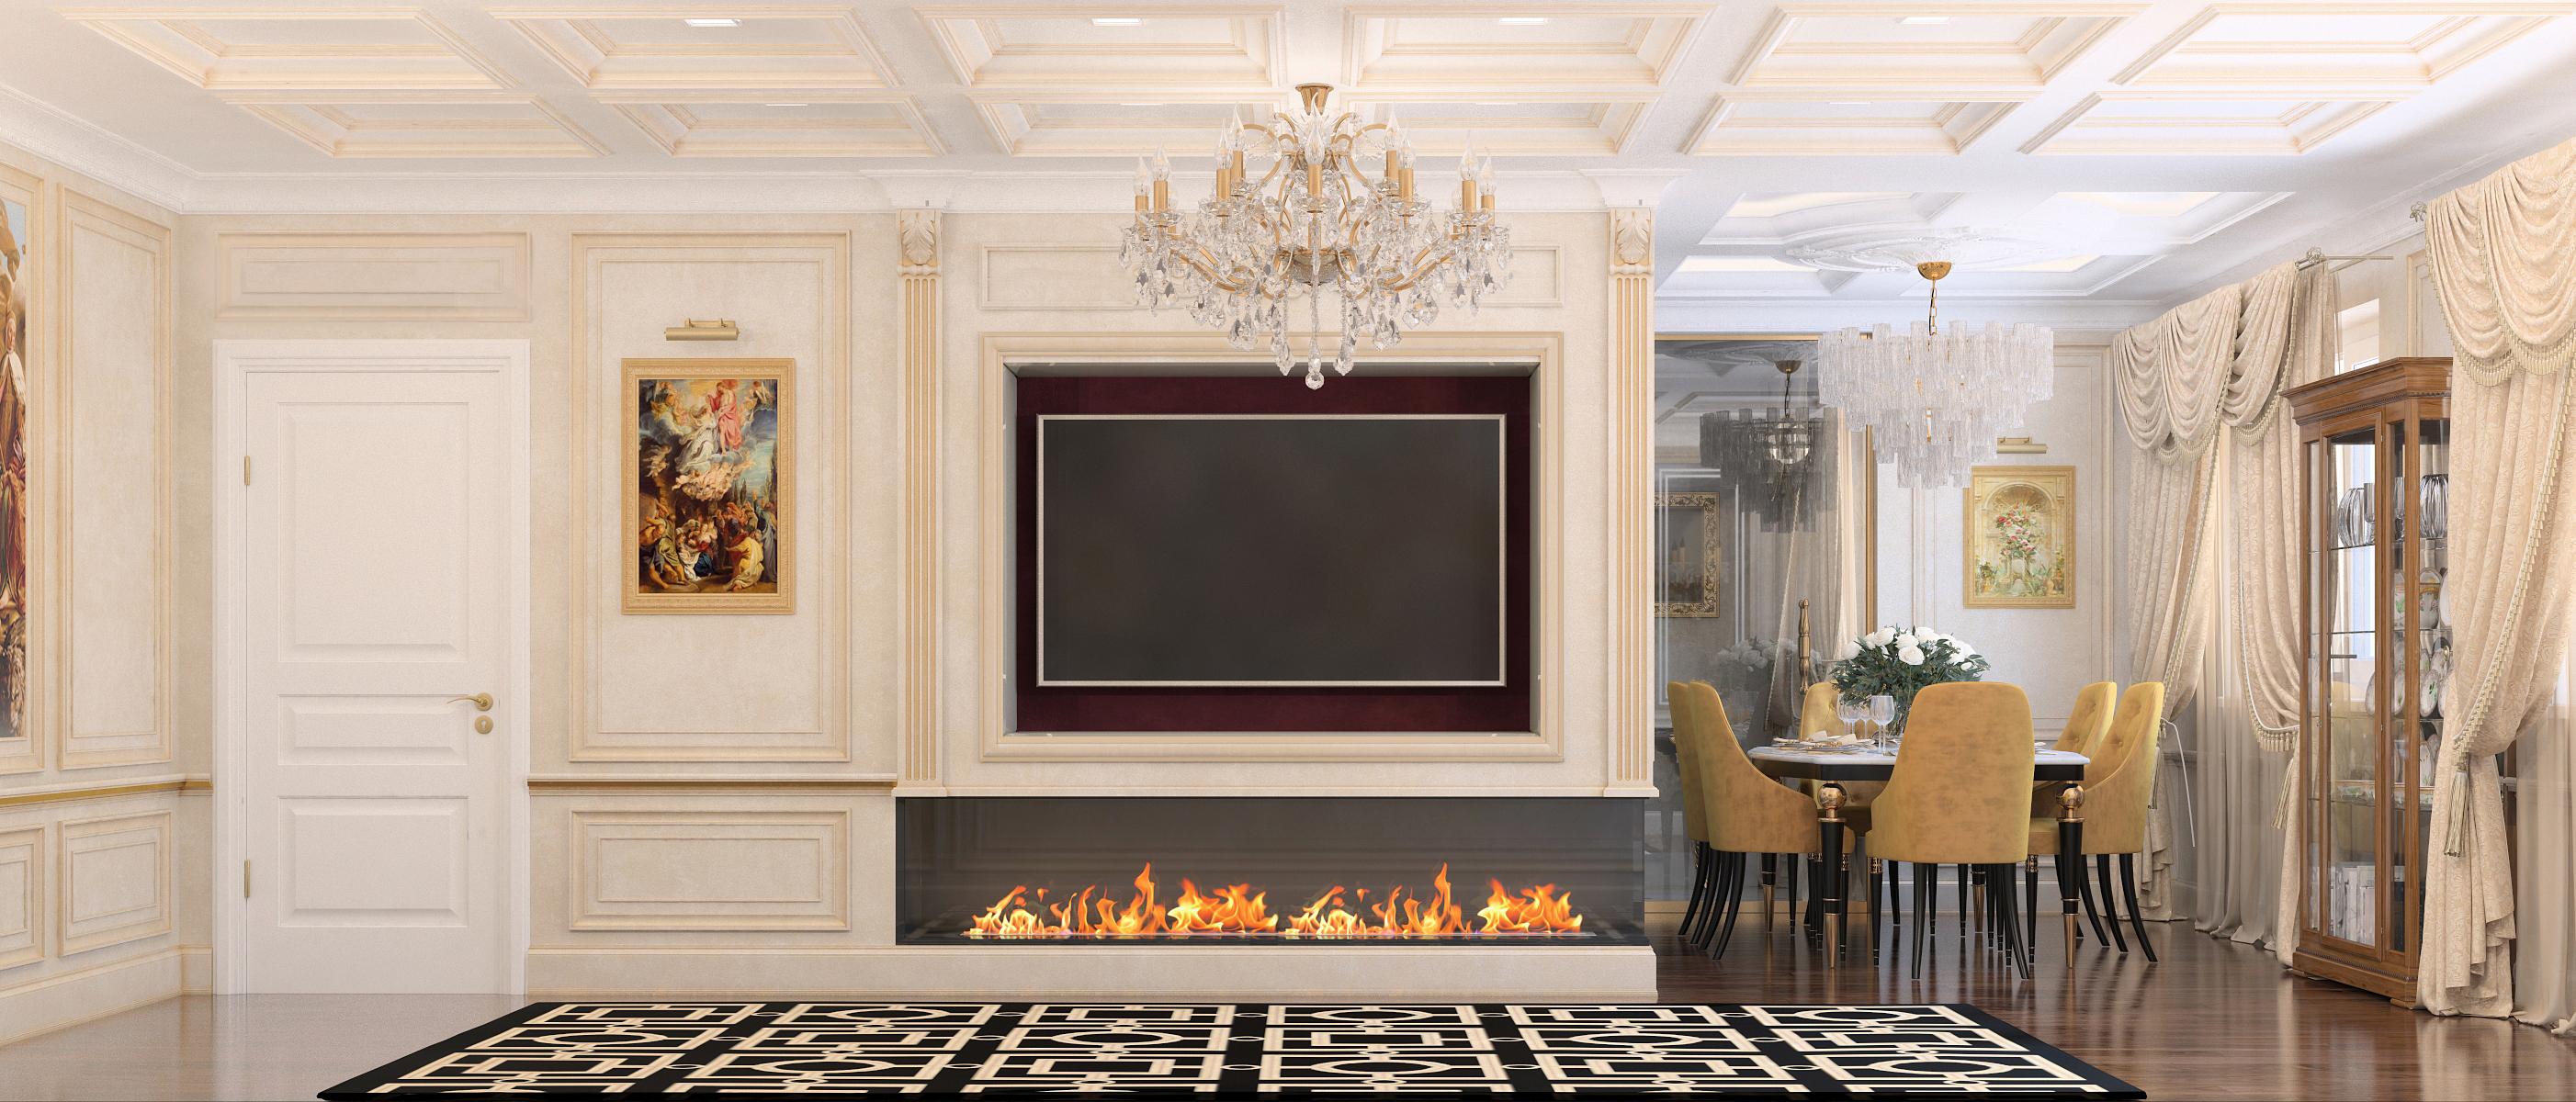 Ремонт четырёхкомнатной квартиры<br> пр. Победителей 133